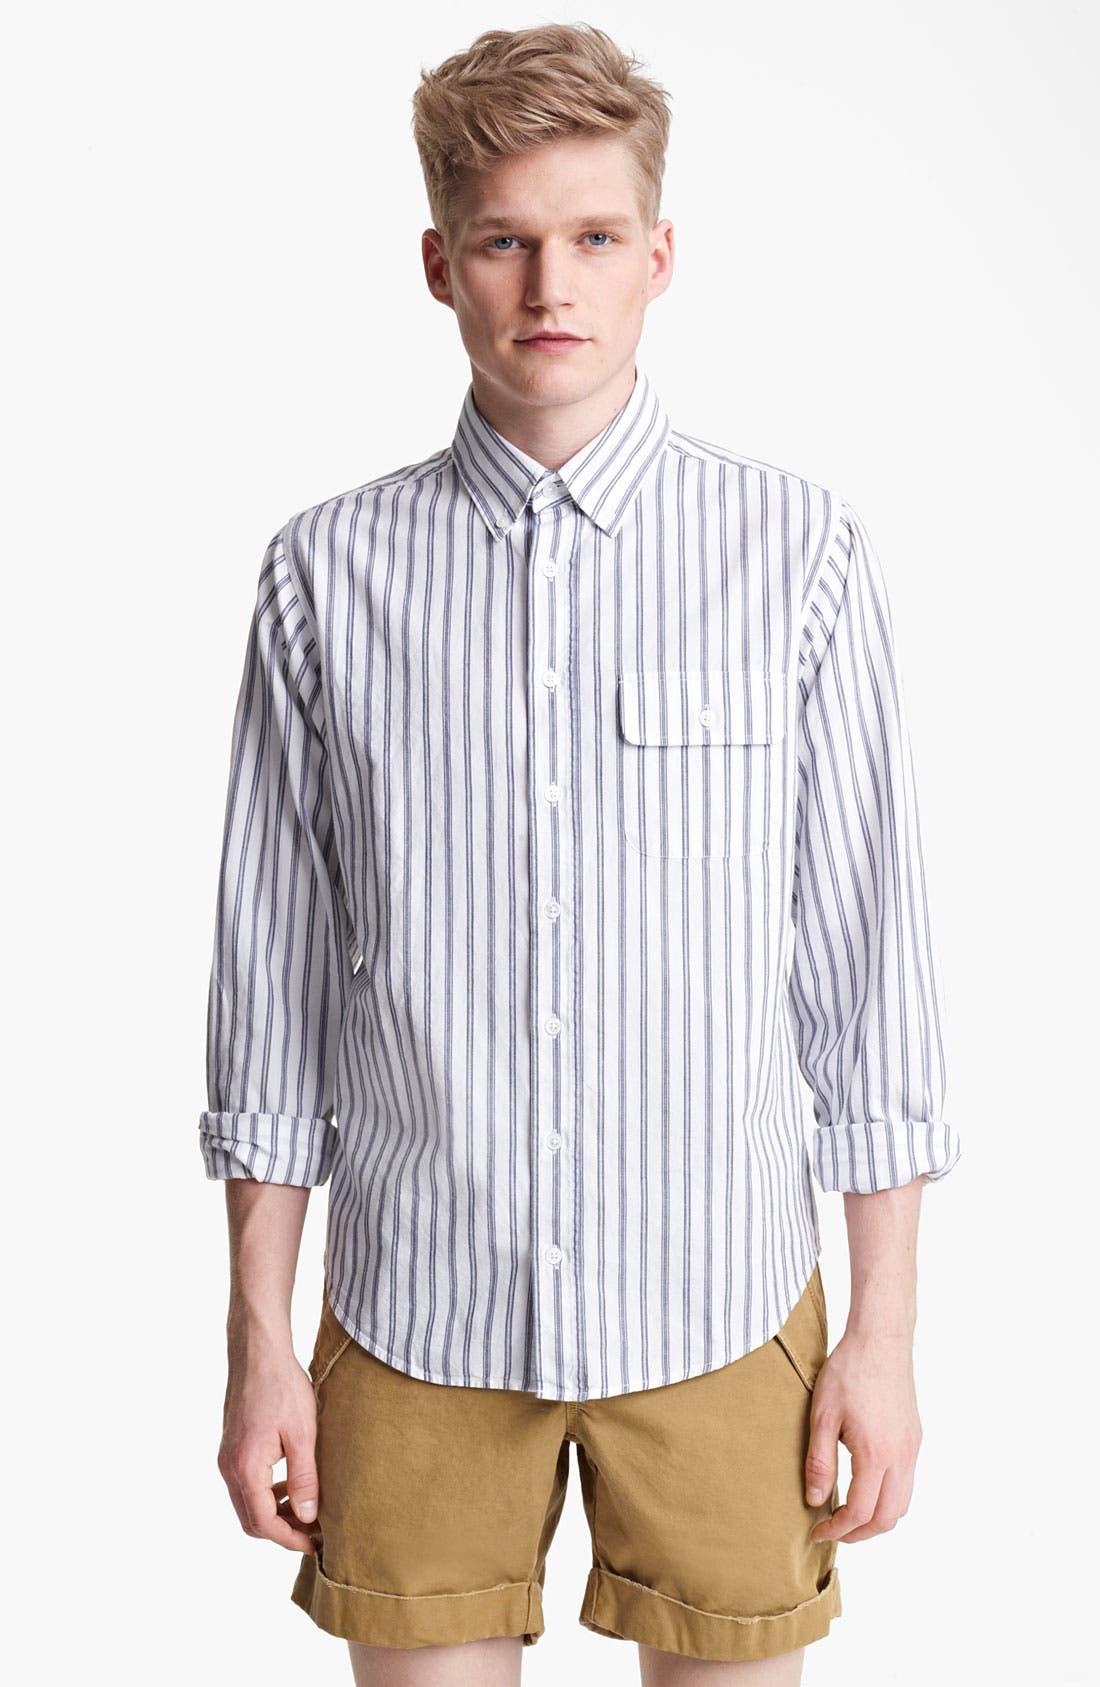 Main Image - Gant by Michael Bastian Ticking Stripe Woven Shirt